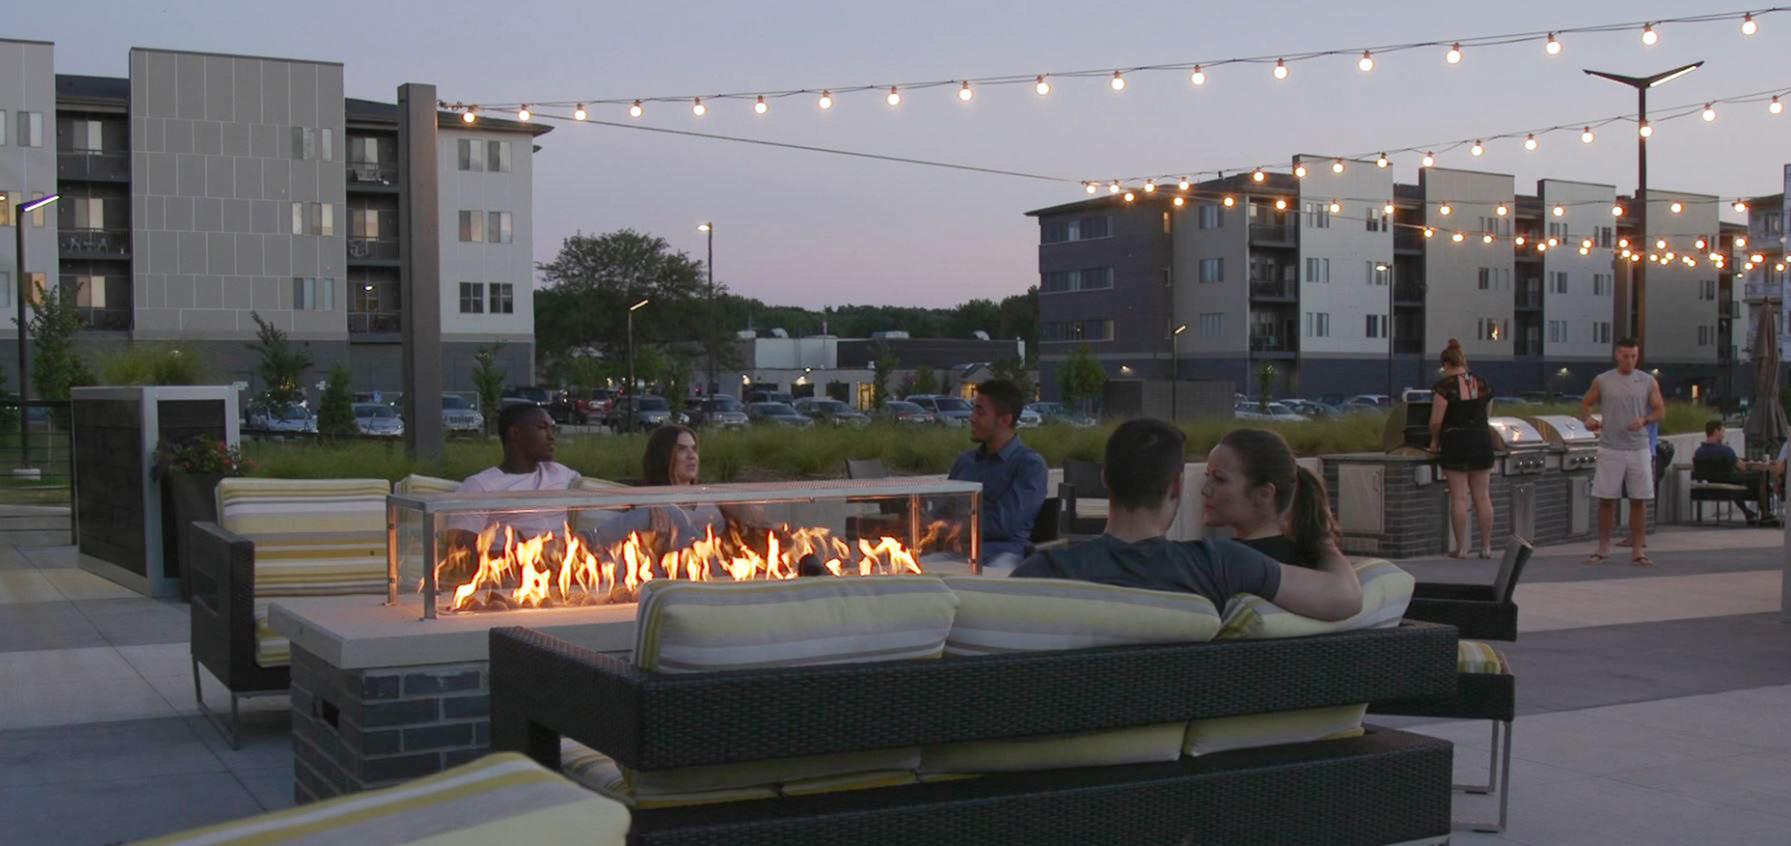 Apartments Near University of Phoenix-Iowa Cityville On 9th for University of Phoenix-Iowa Students in Des Moines, IA